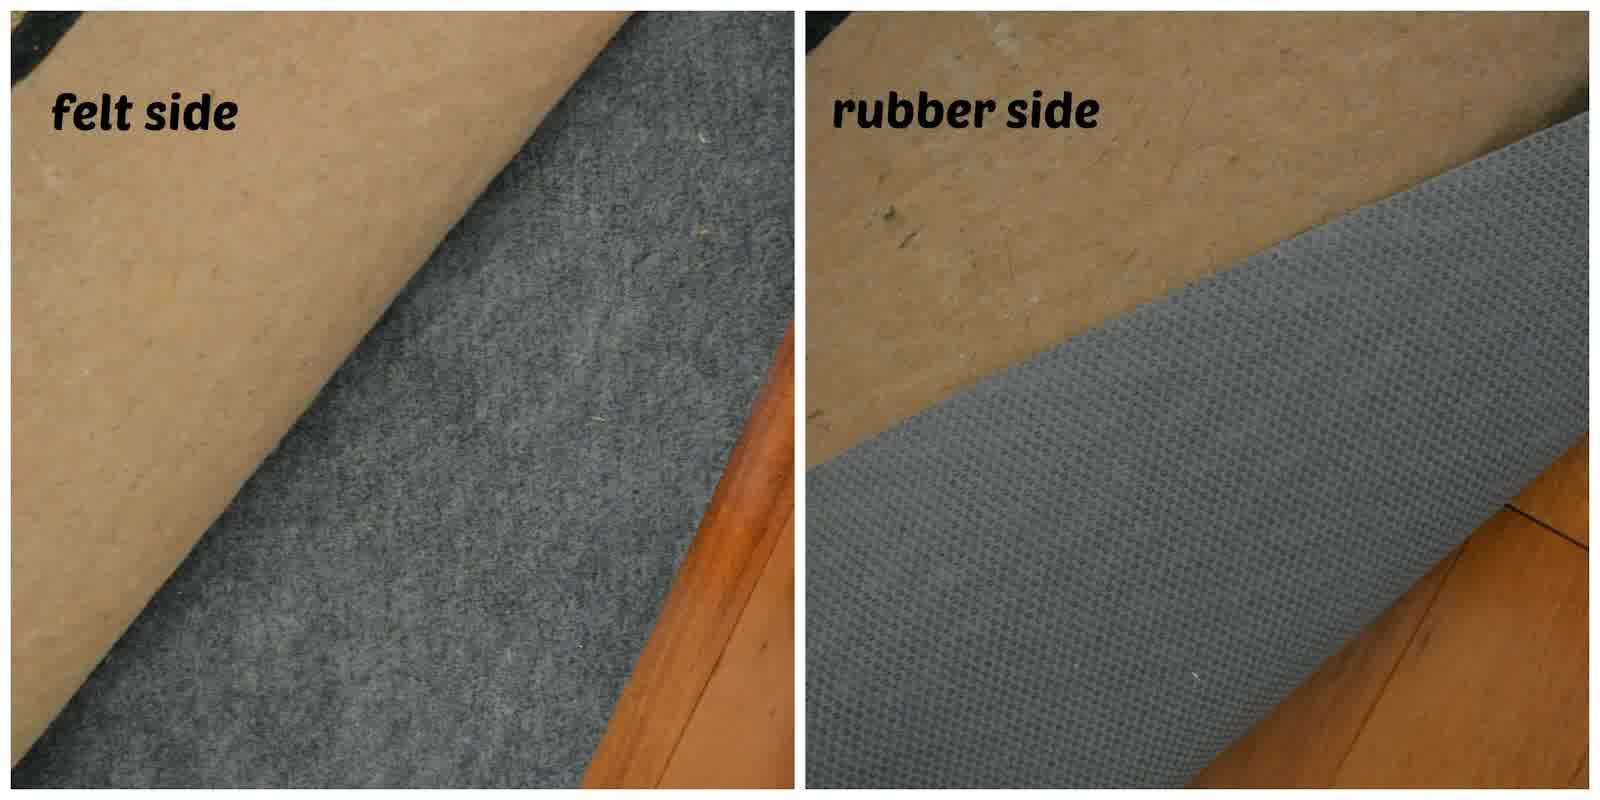 Best Rug Pads For Hardwood Floors Of Rubber Side And Felt Side